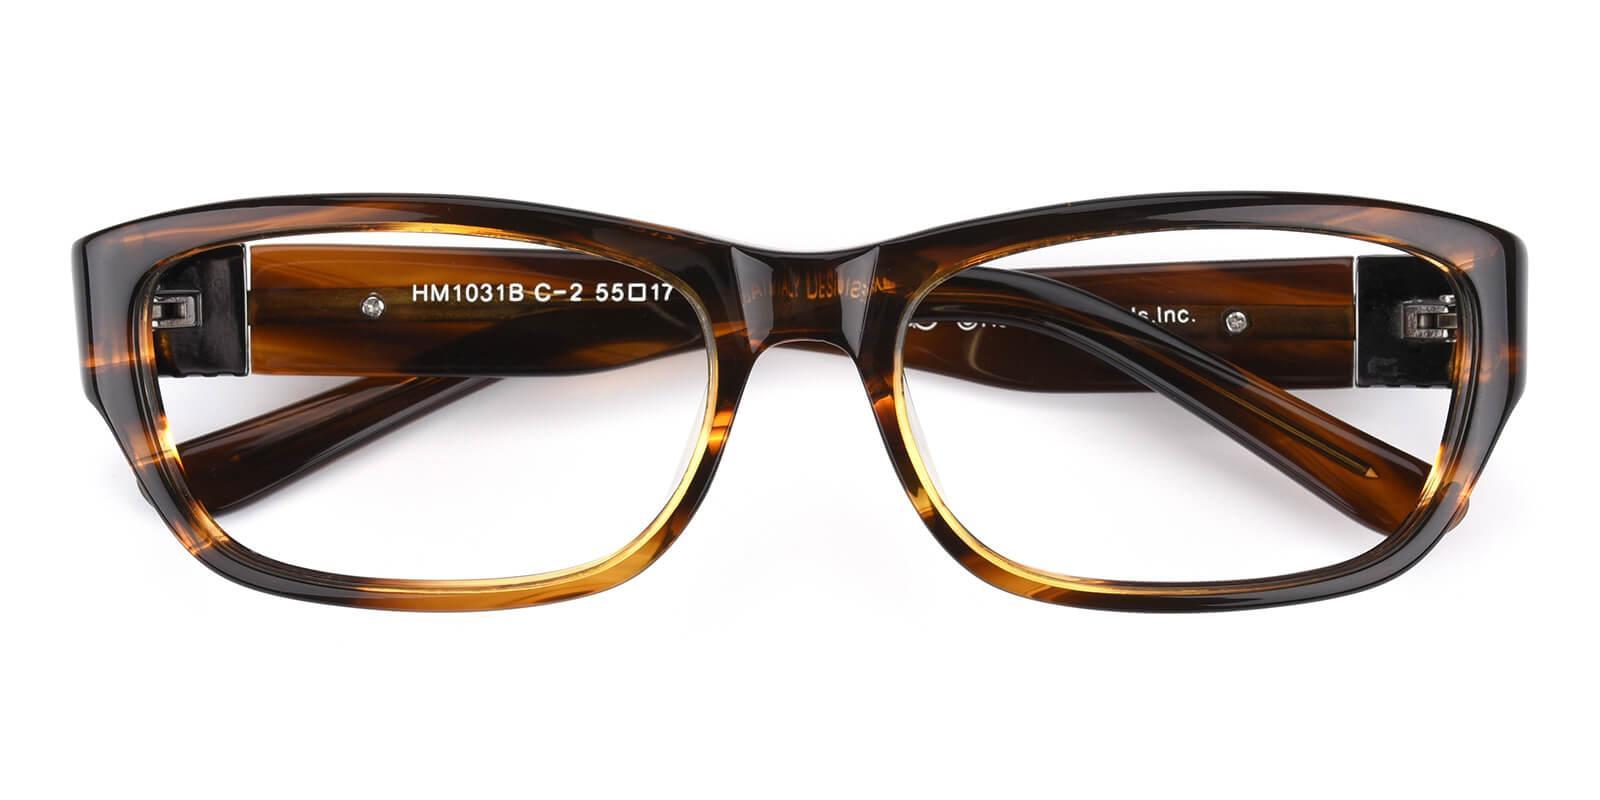 Travis-Tortoise-Rectangle-Acetate-Eyeglasses-detail